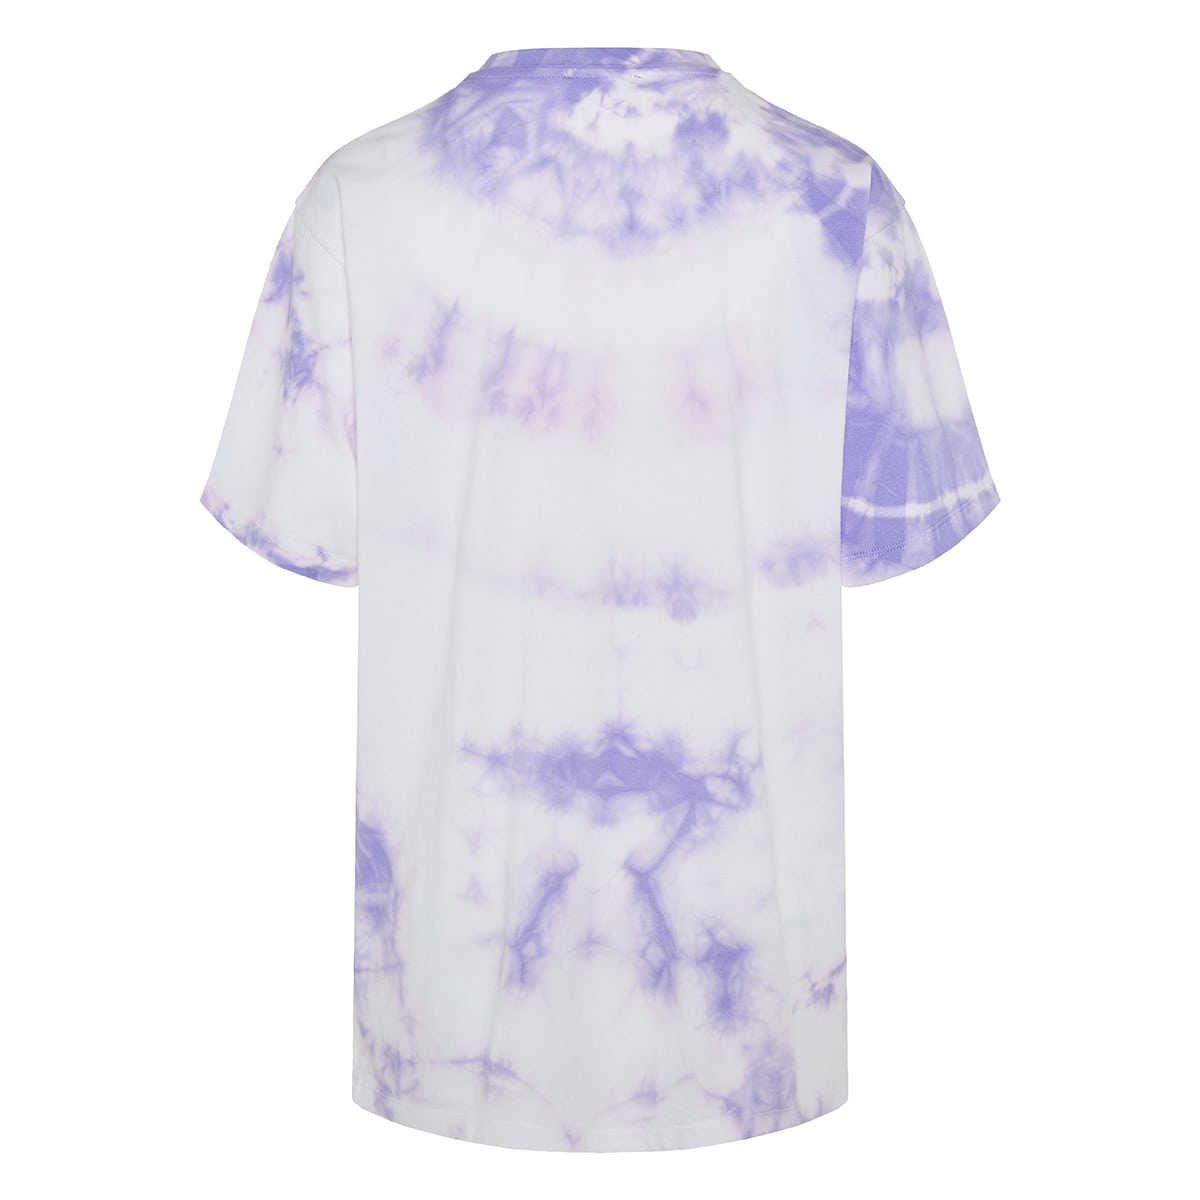 Oversized tie-dye logo t-shirt